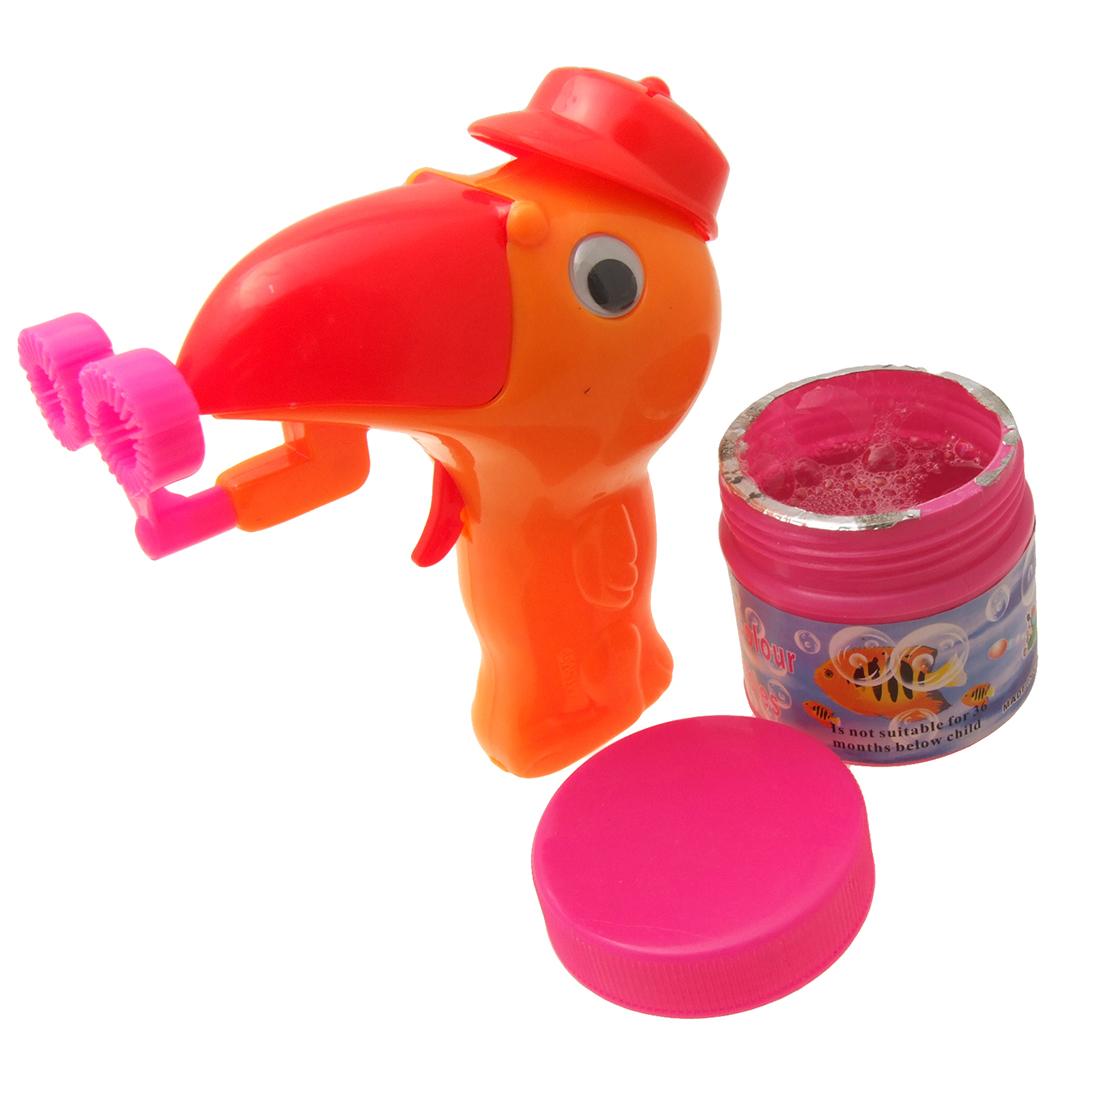 Red Mouth Orange Bird Hubble Bubble Children's Water Gun Toy